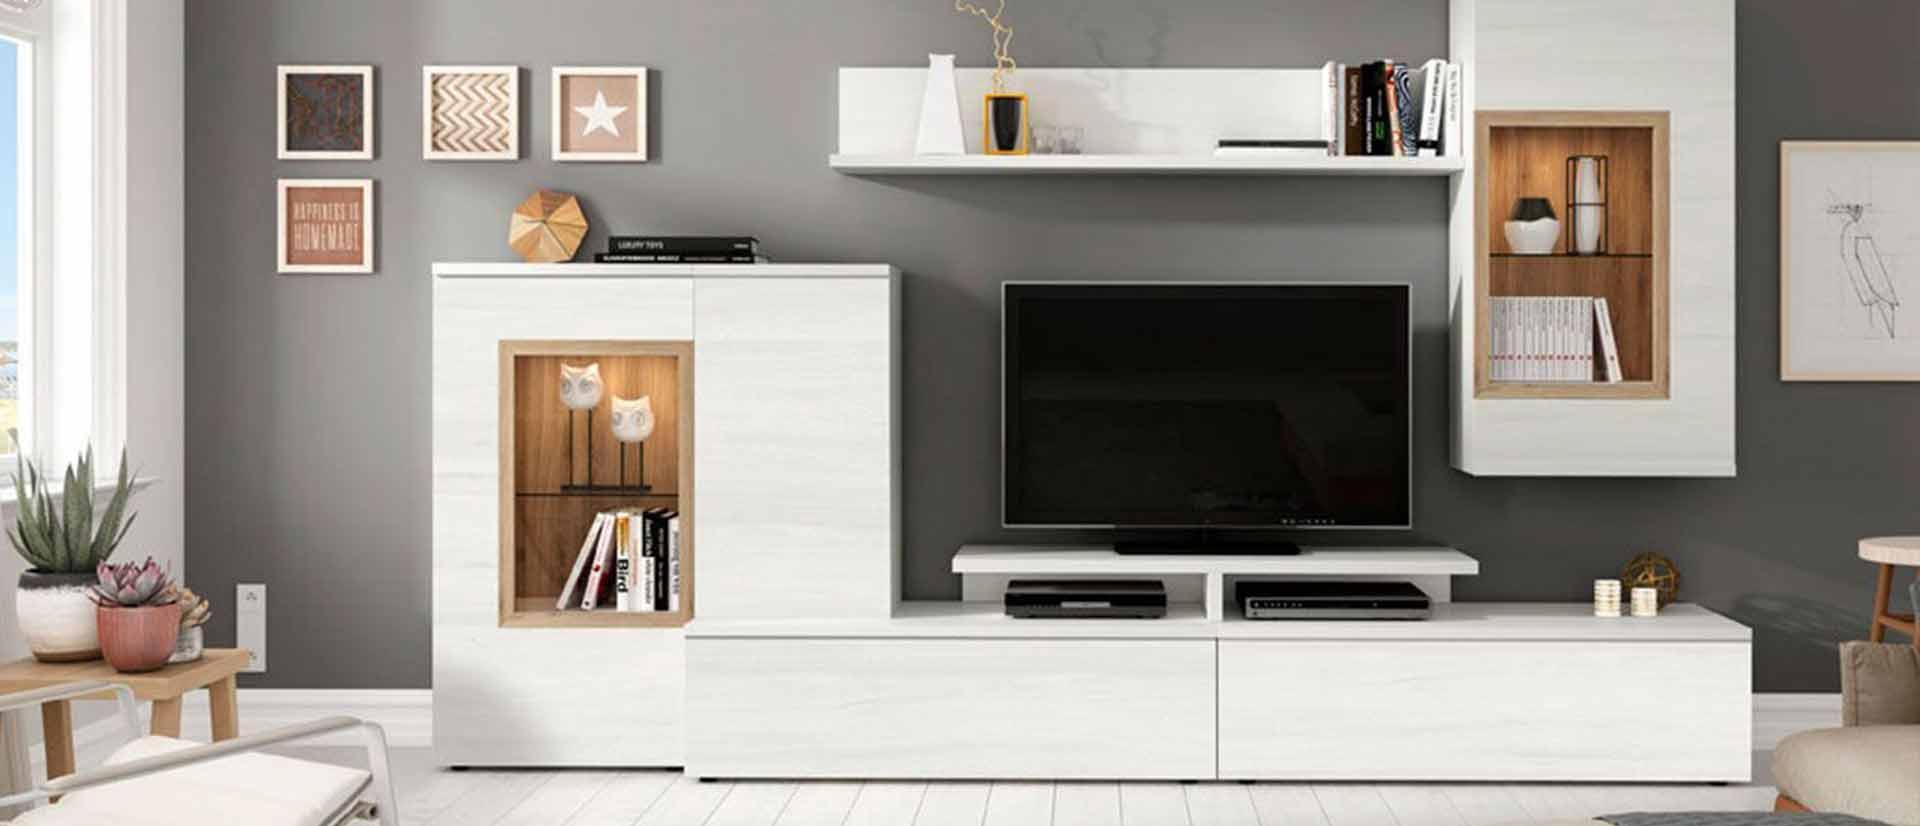 mueble para tv blanco